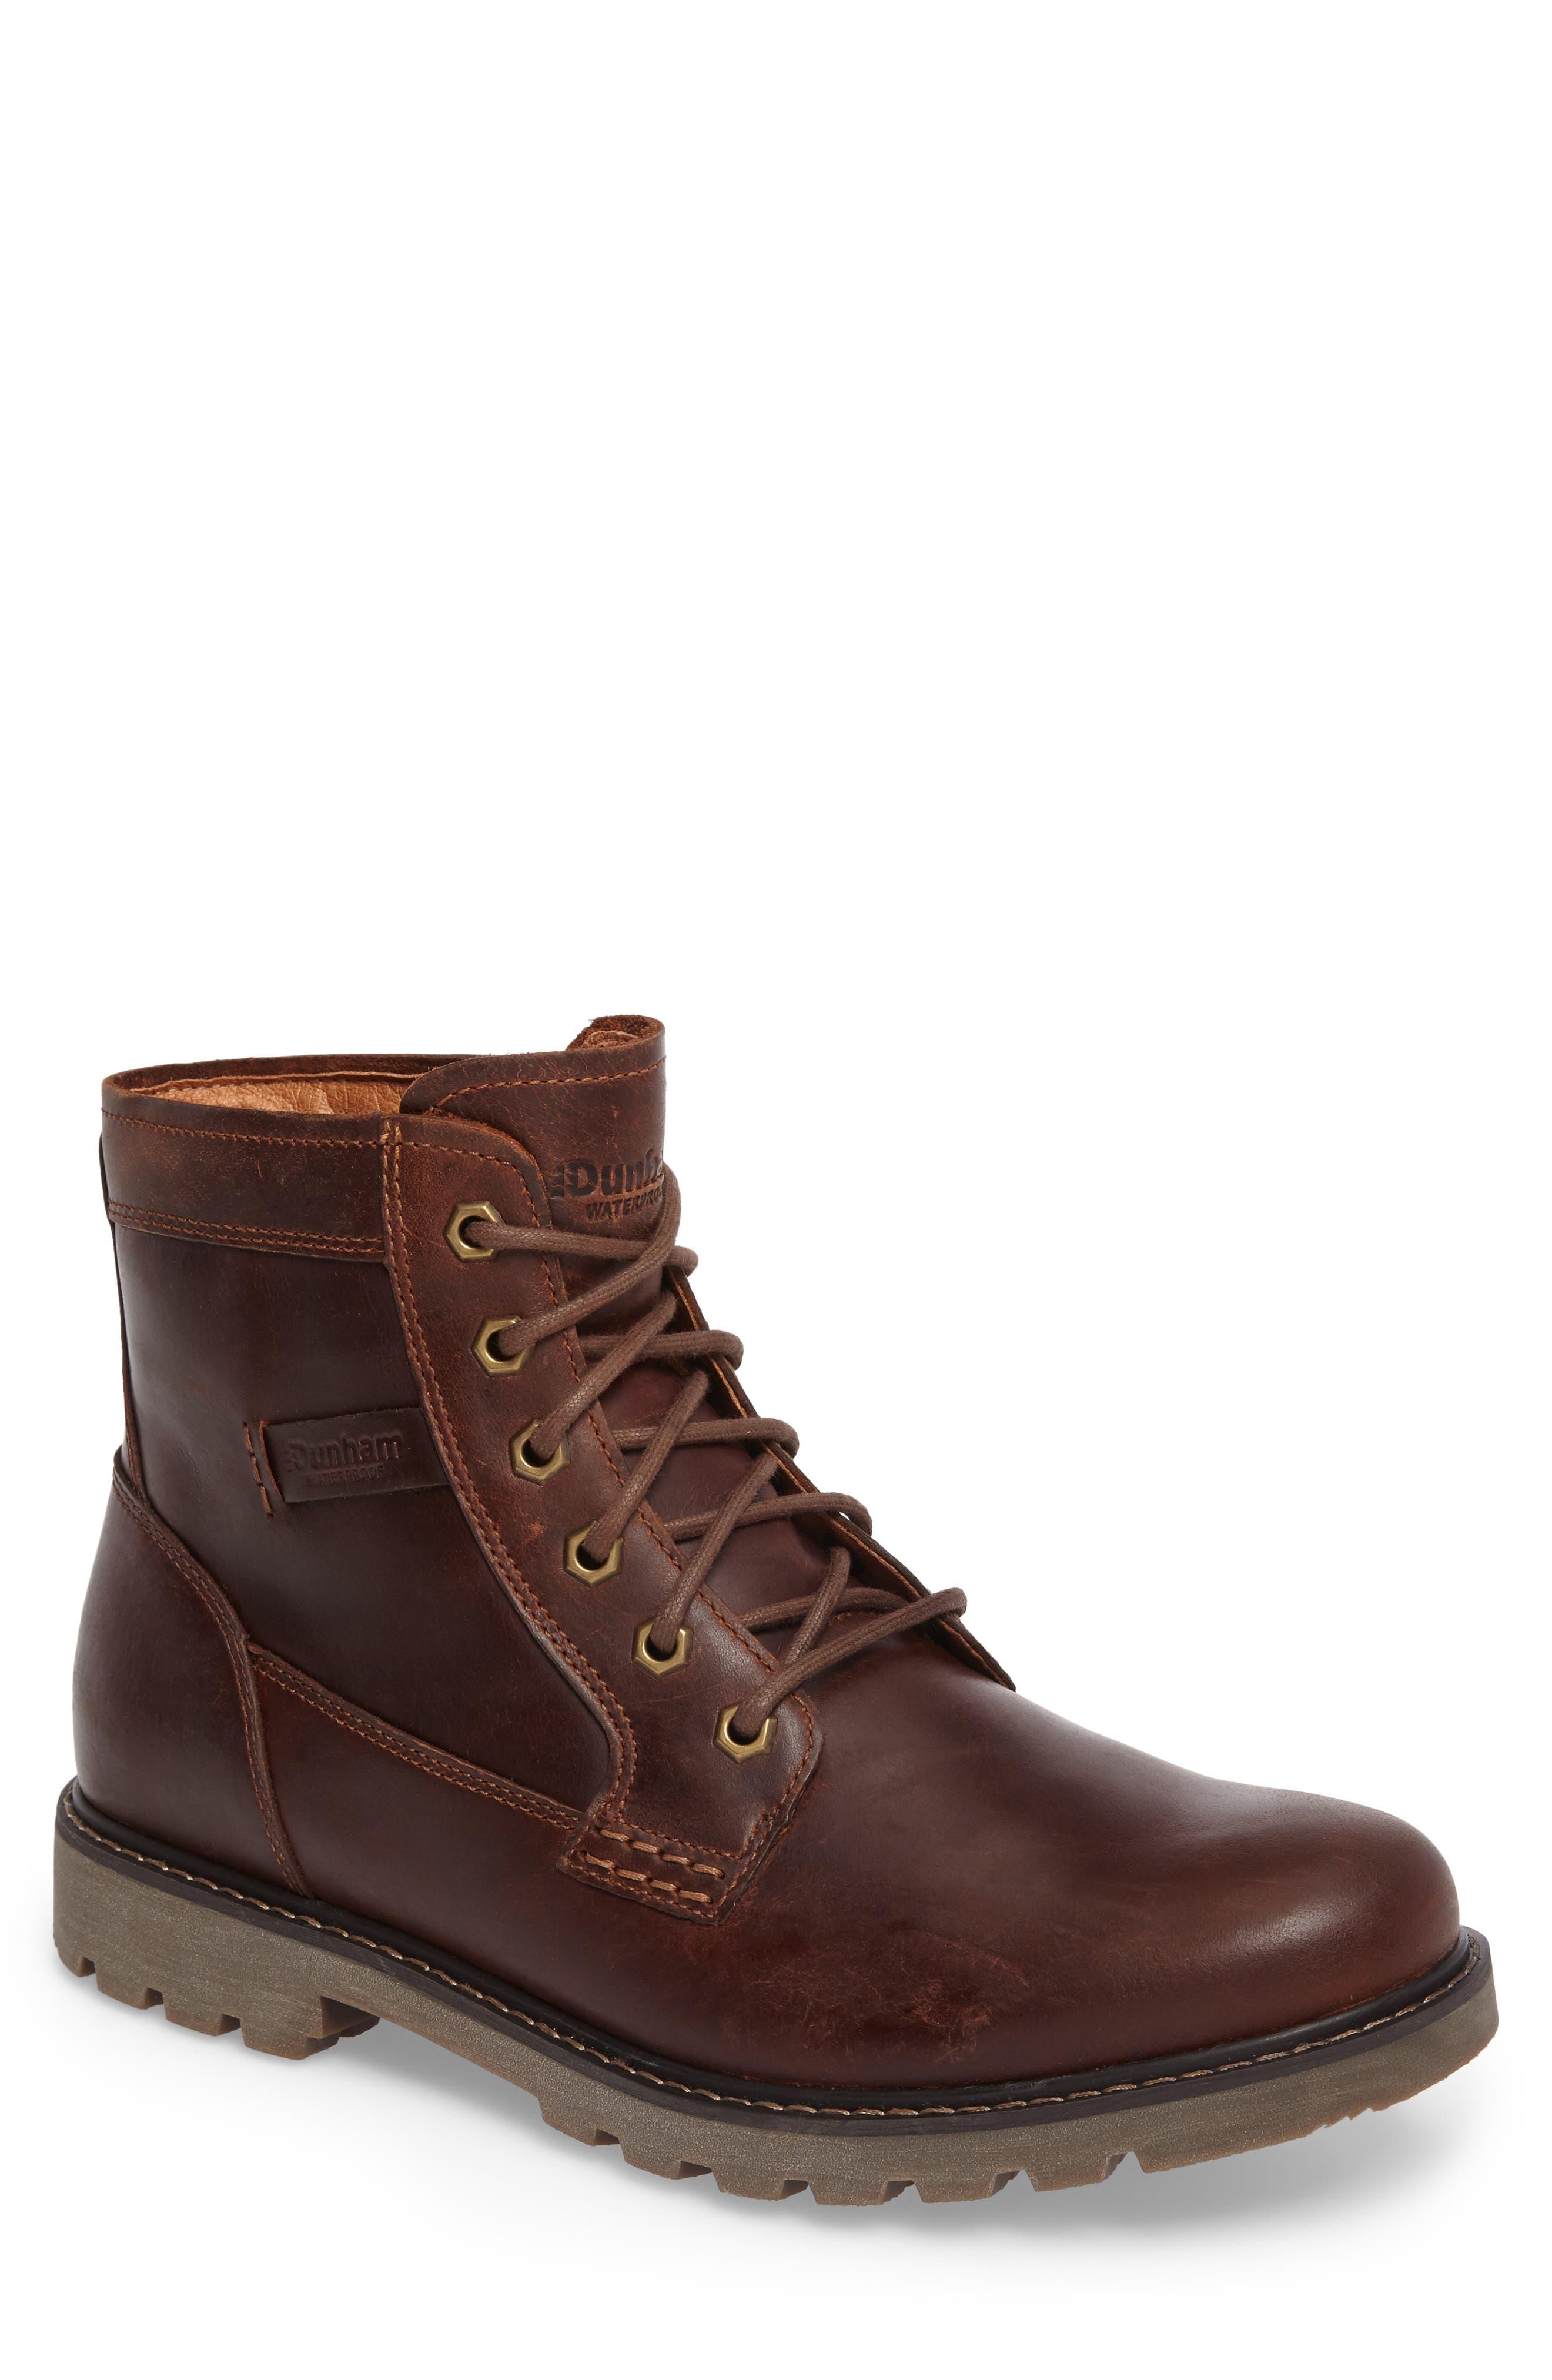 DUNHAM, Royalton Plain Toe Boot, Main thumbnail 1, color, BROWN